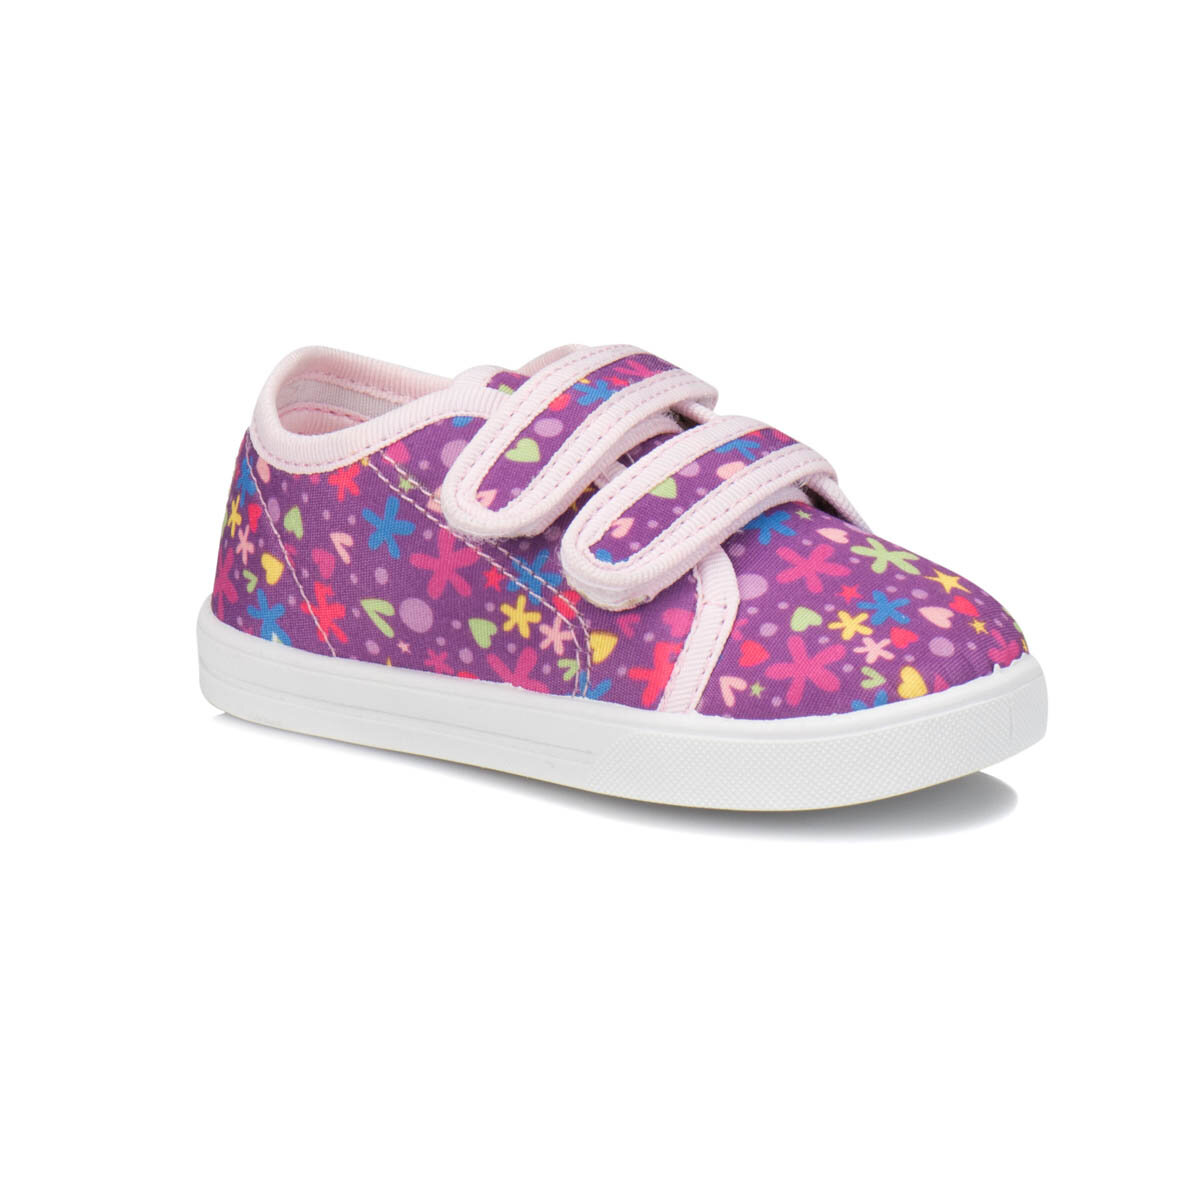 FLO FOREN Pink Female Child Sneaker Shoes KINETIX